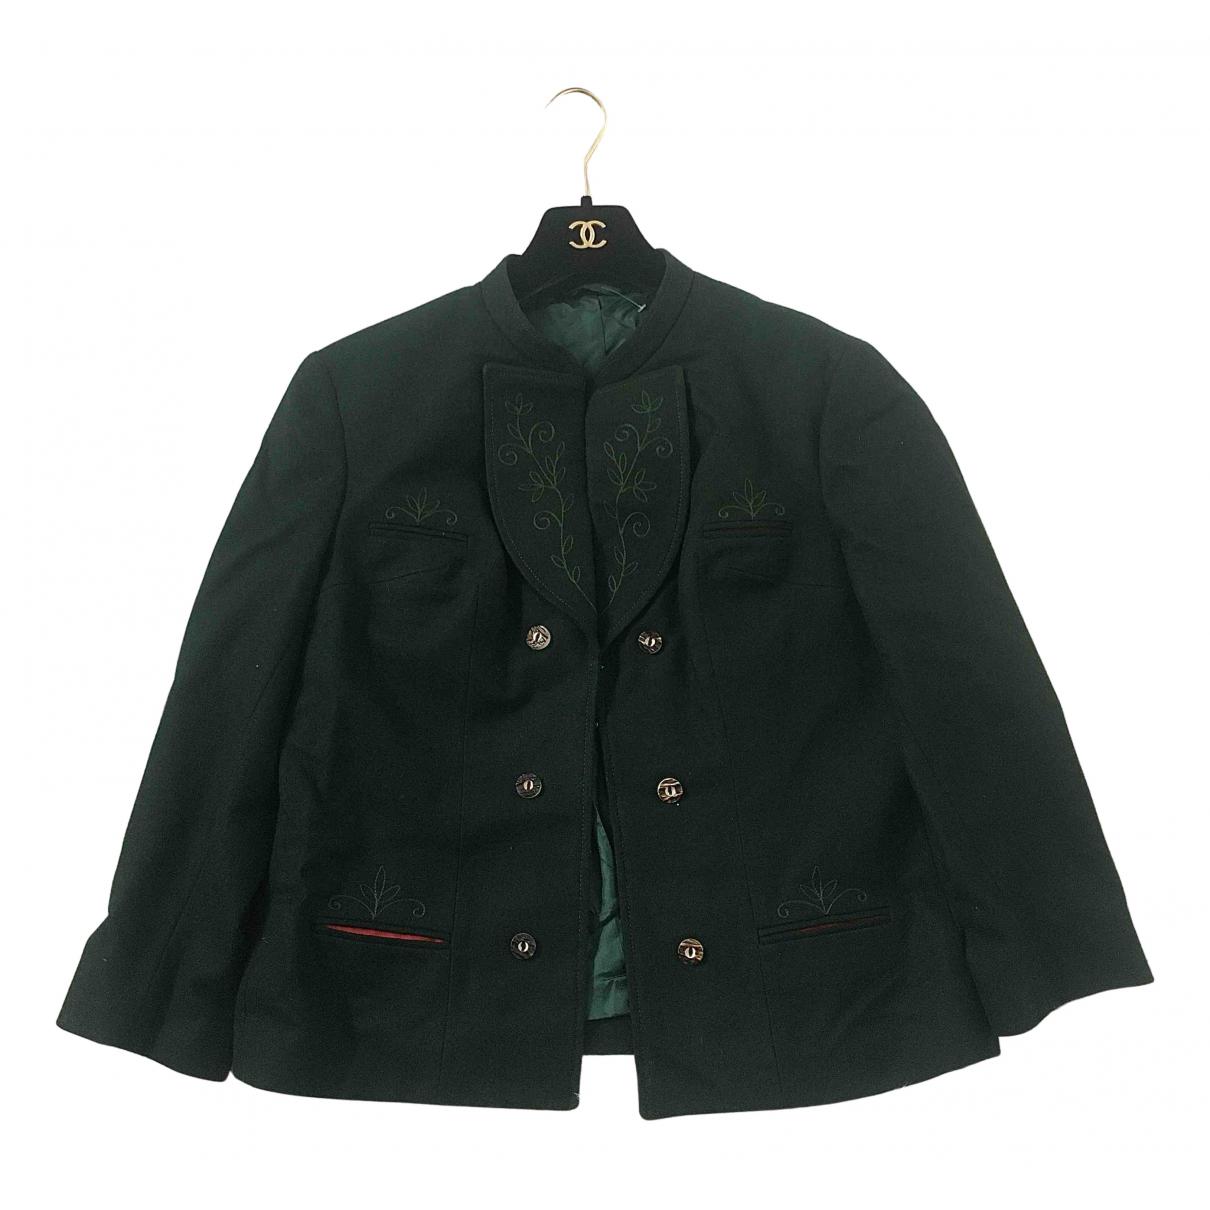 - Veste Epaulettes pour femme en laine - vert